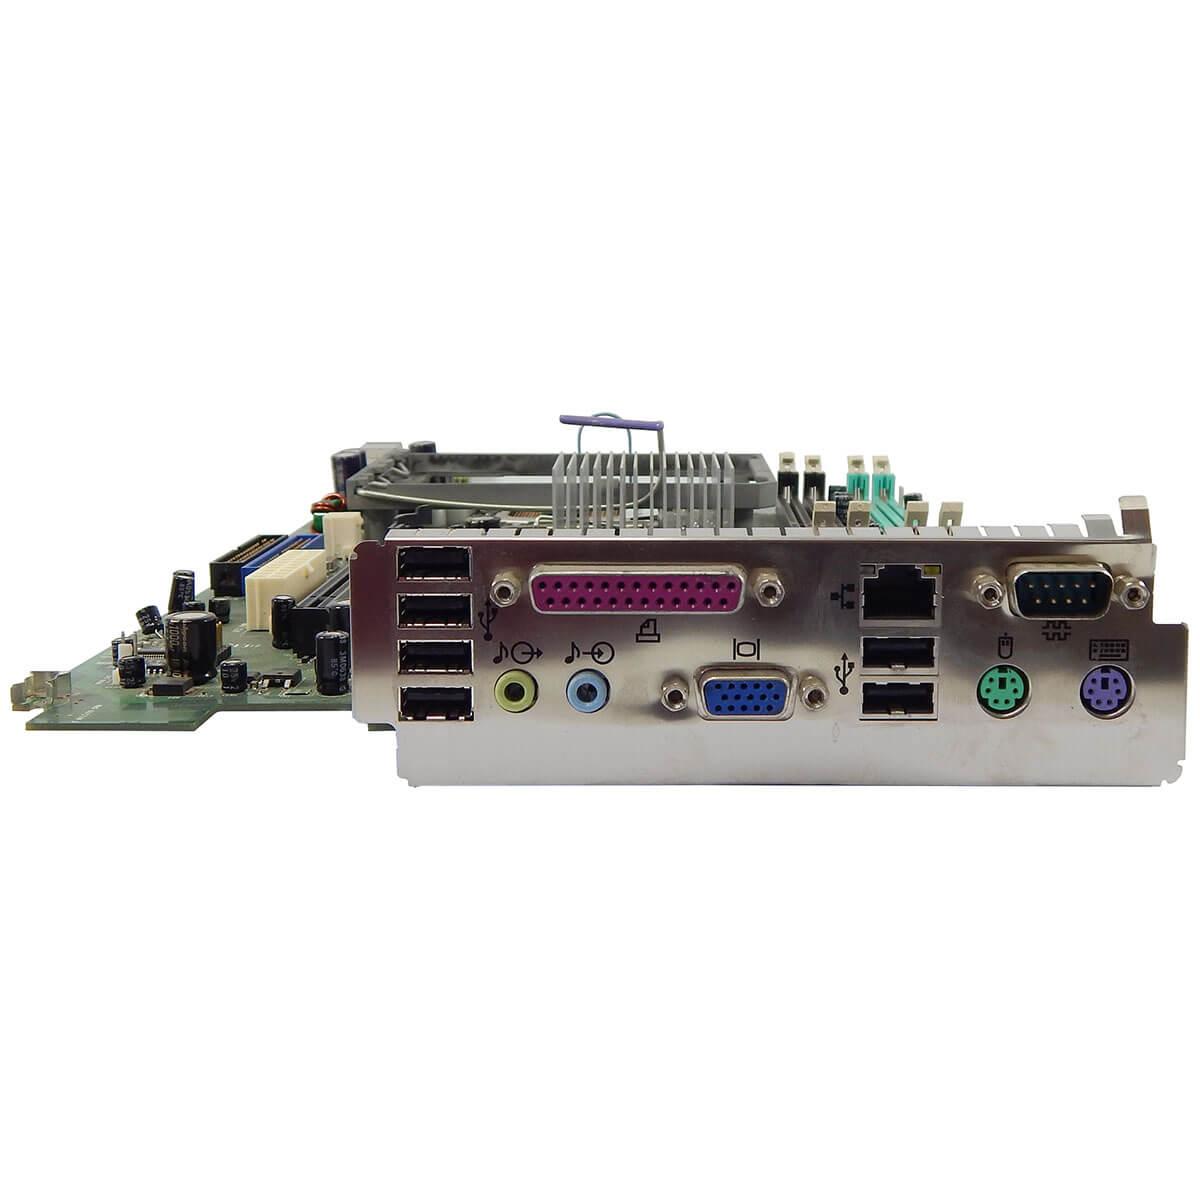 Placa Mãe IBM Lenovo ThinkCentre A52 / M52 LGA775